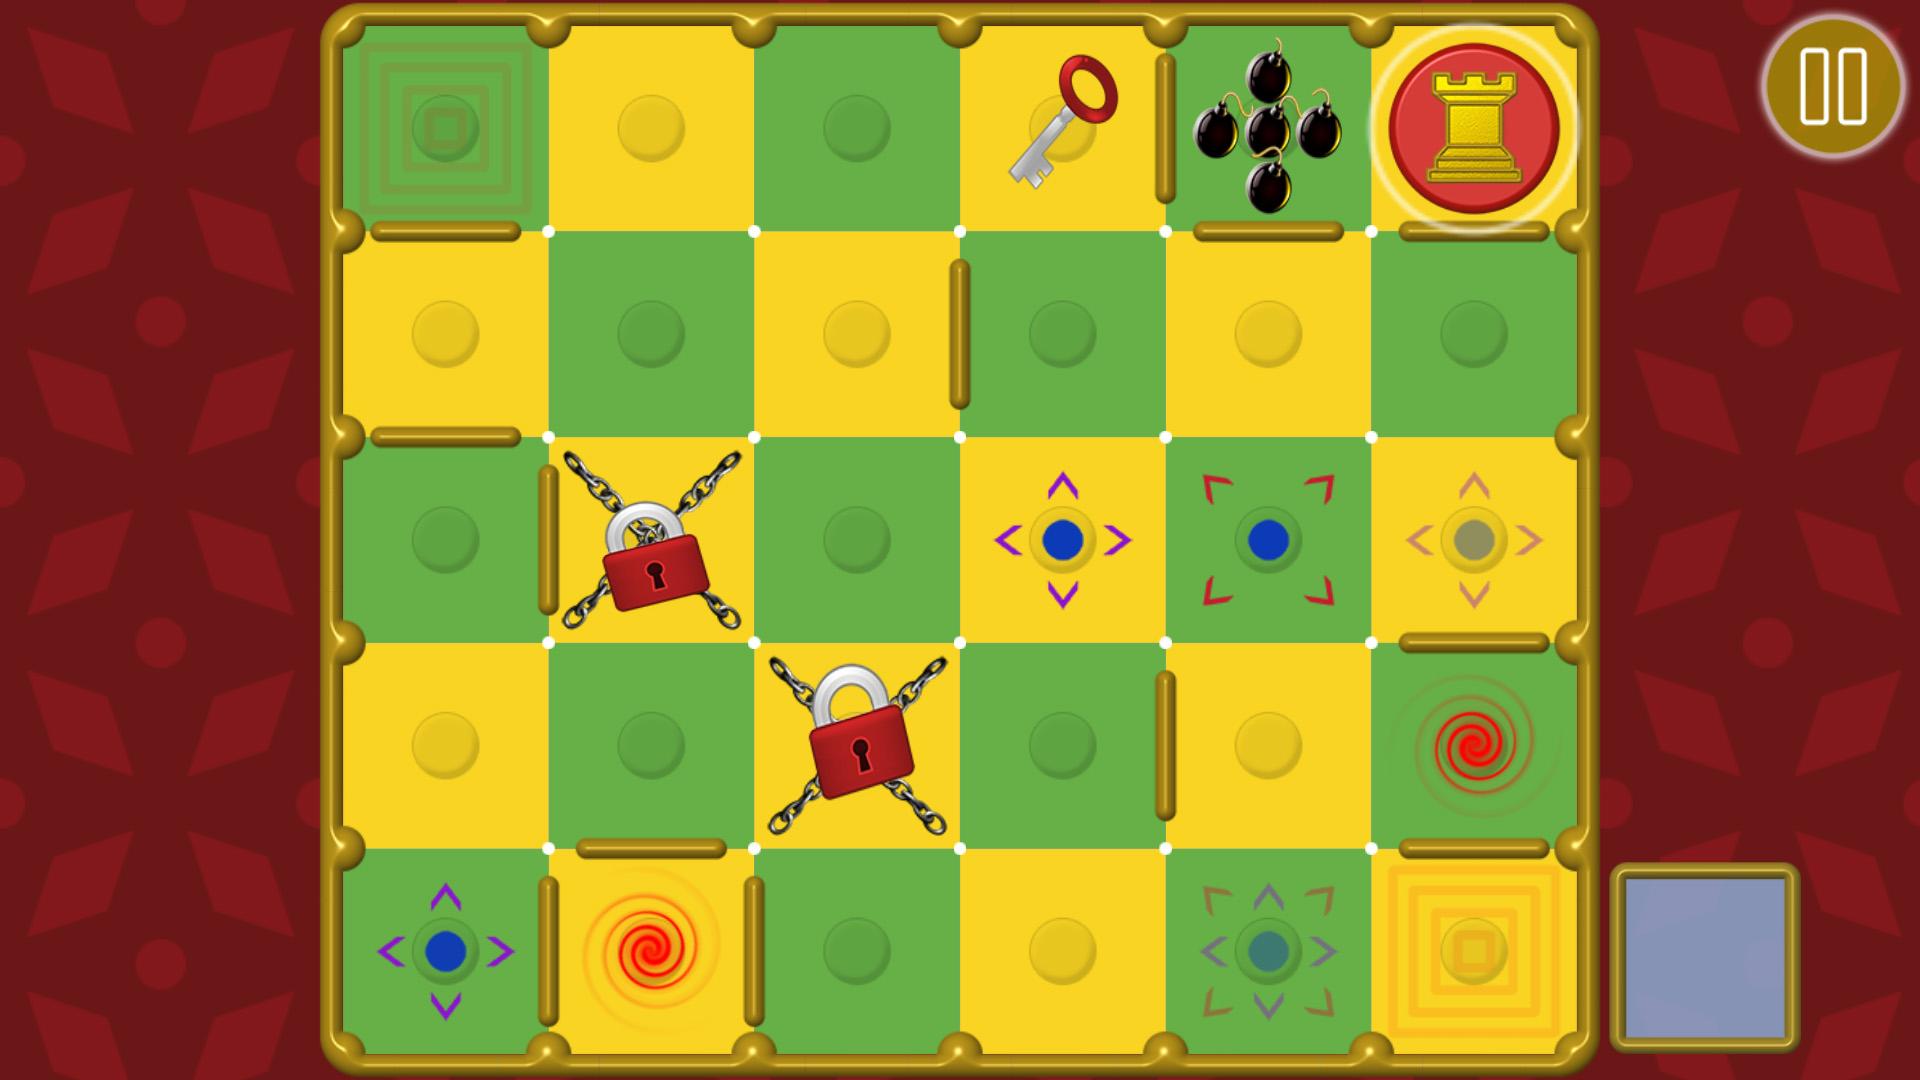 http://onpixelgames.com/wp-content/uploads/2017/09/Stage-4-20.jpg